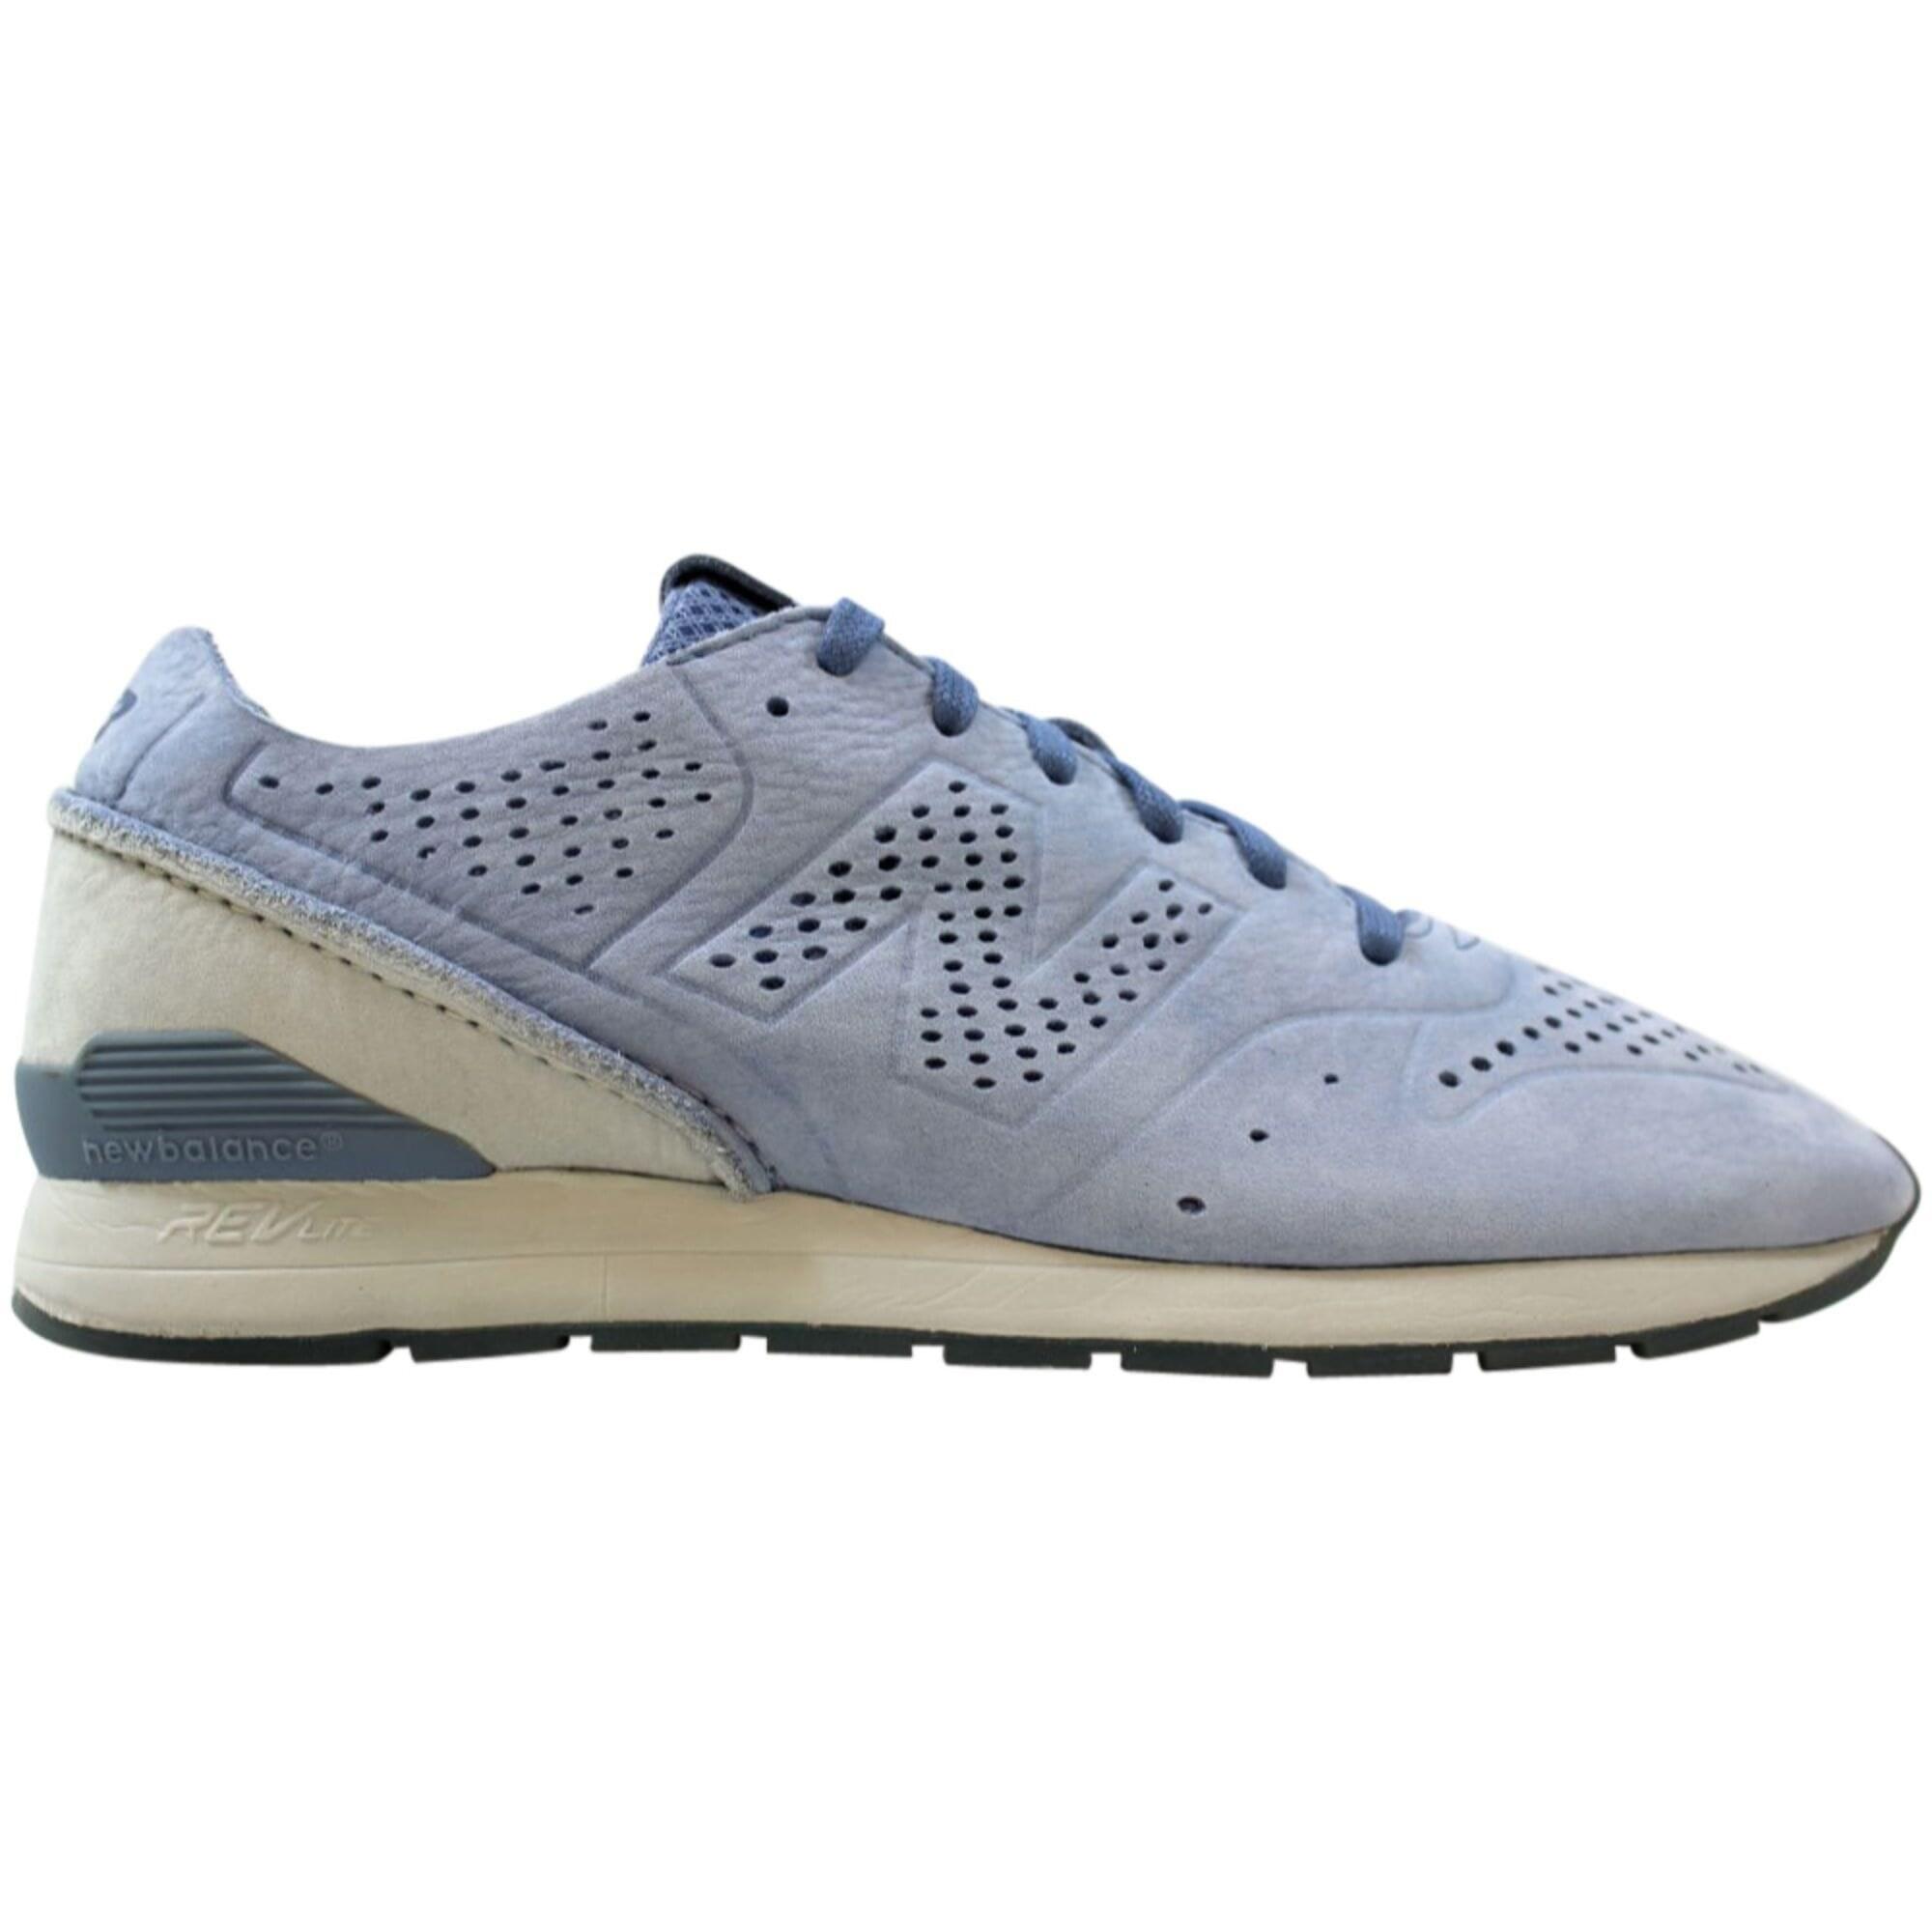 New Balance REVlite MRL996 Slate Blue/Concrete MRL996DE Men's